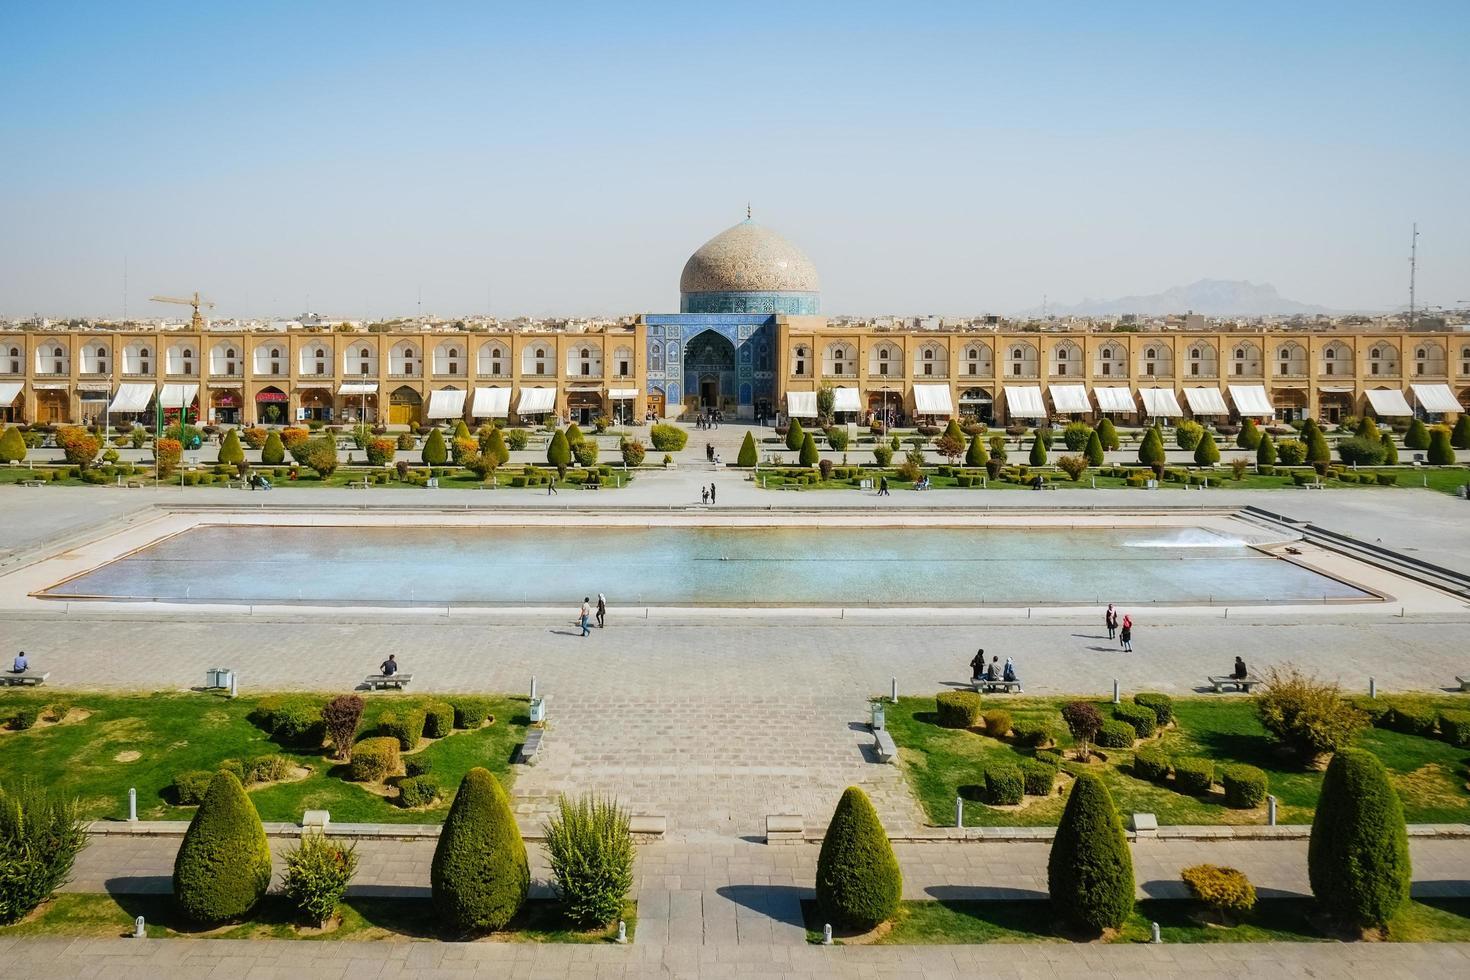 Naqsh-e Jahan Square à Ispahan, Iran. photo